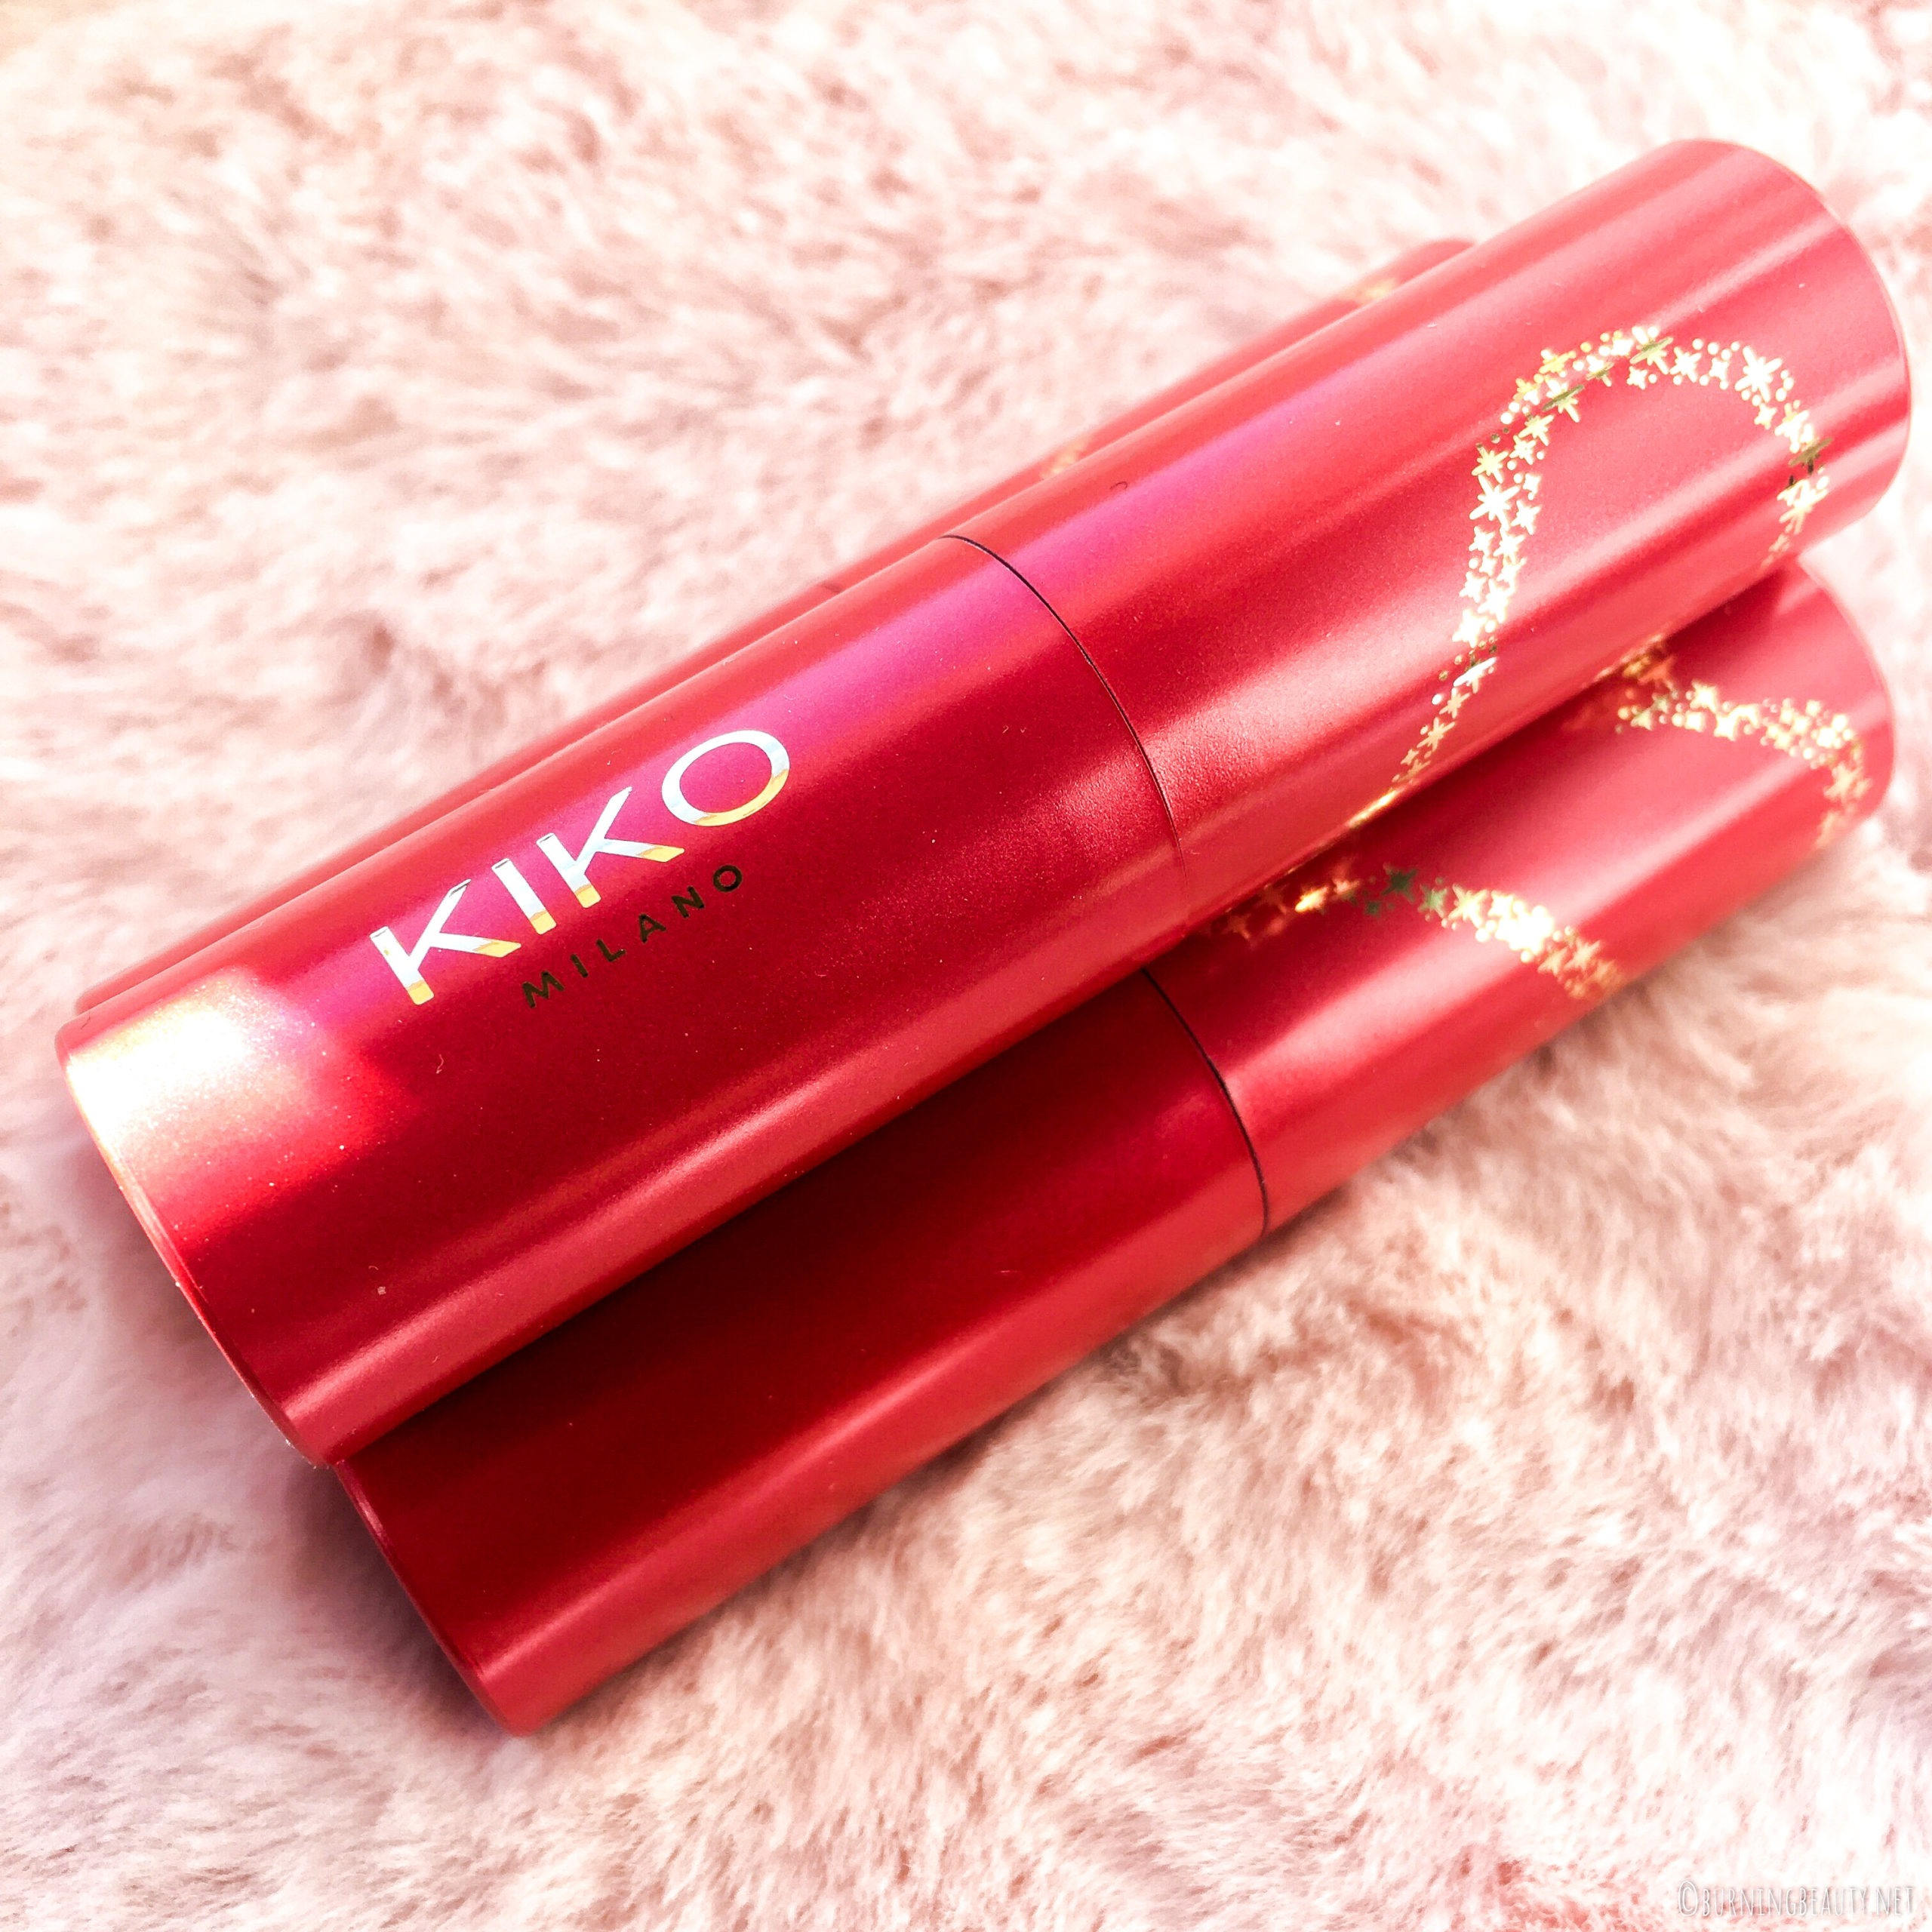 Kiko Ray of Love Long Lasting Lip Stylo